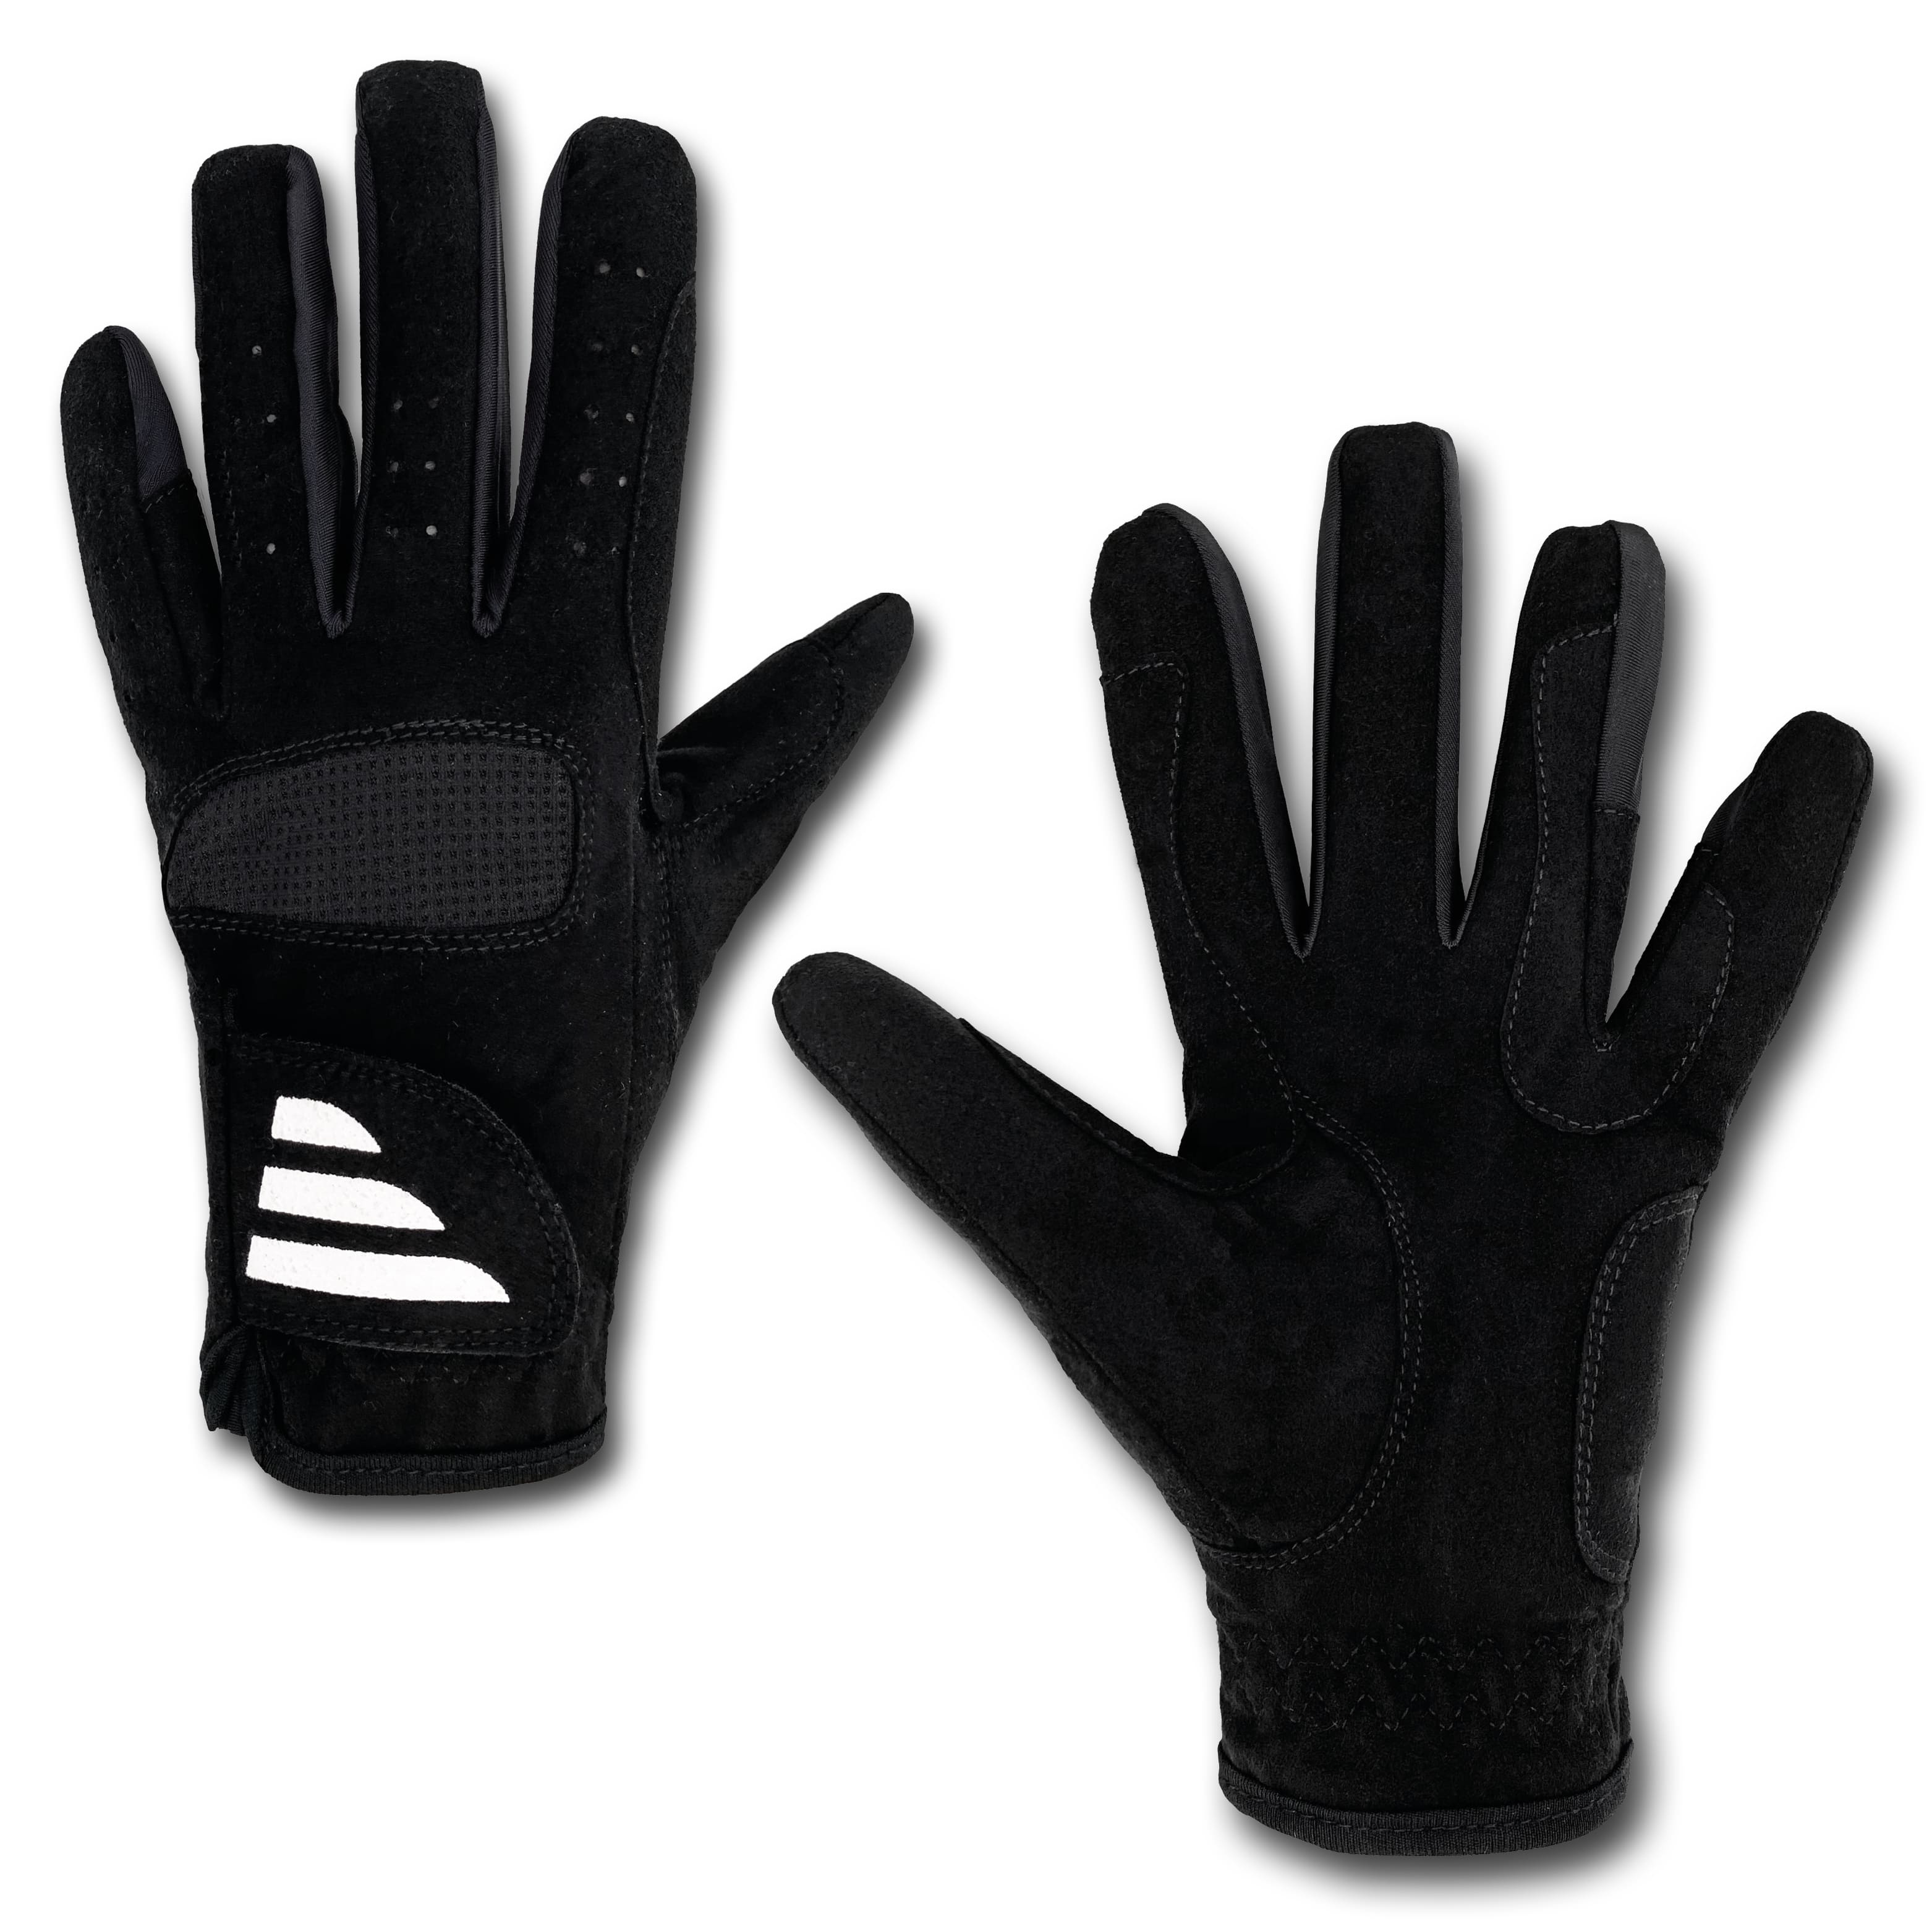 Reithandschuh-Handschuh-Reiten-schwarz